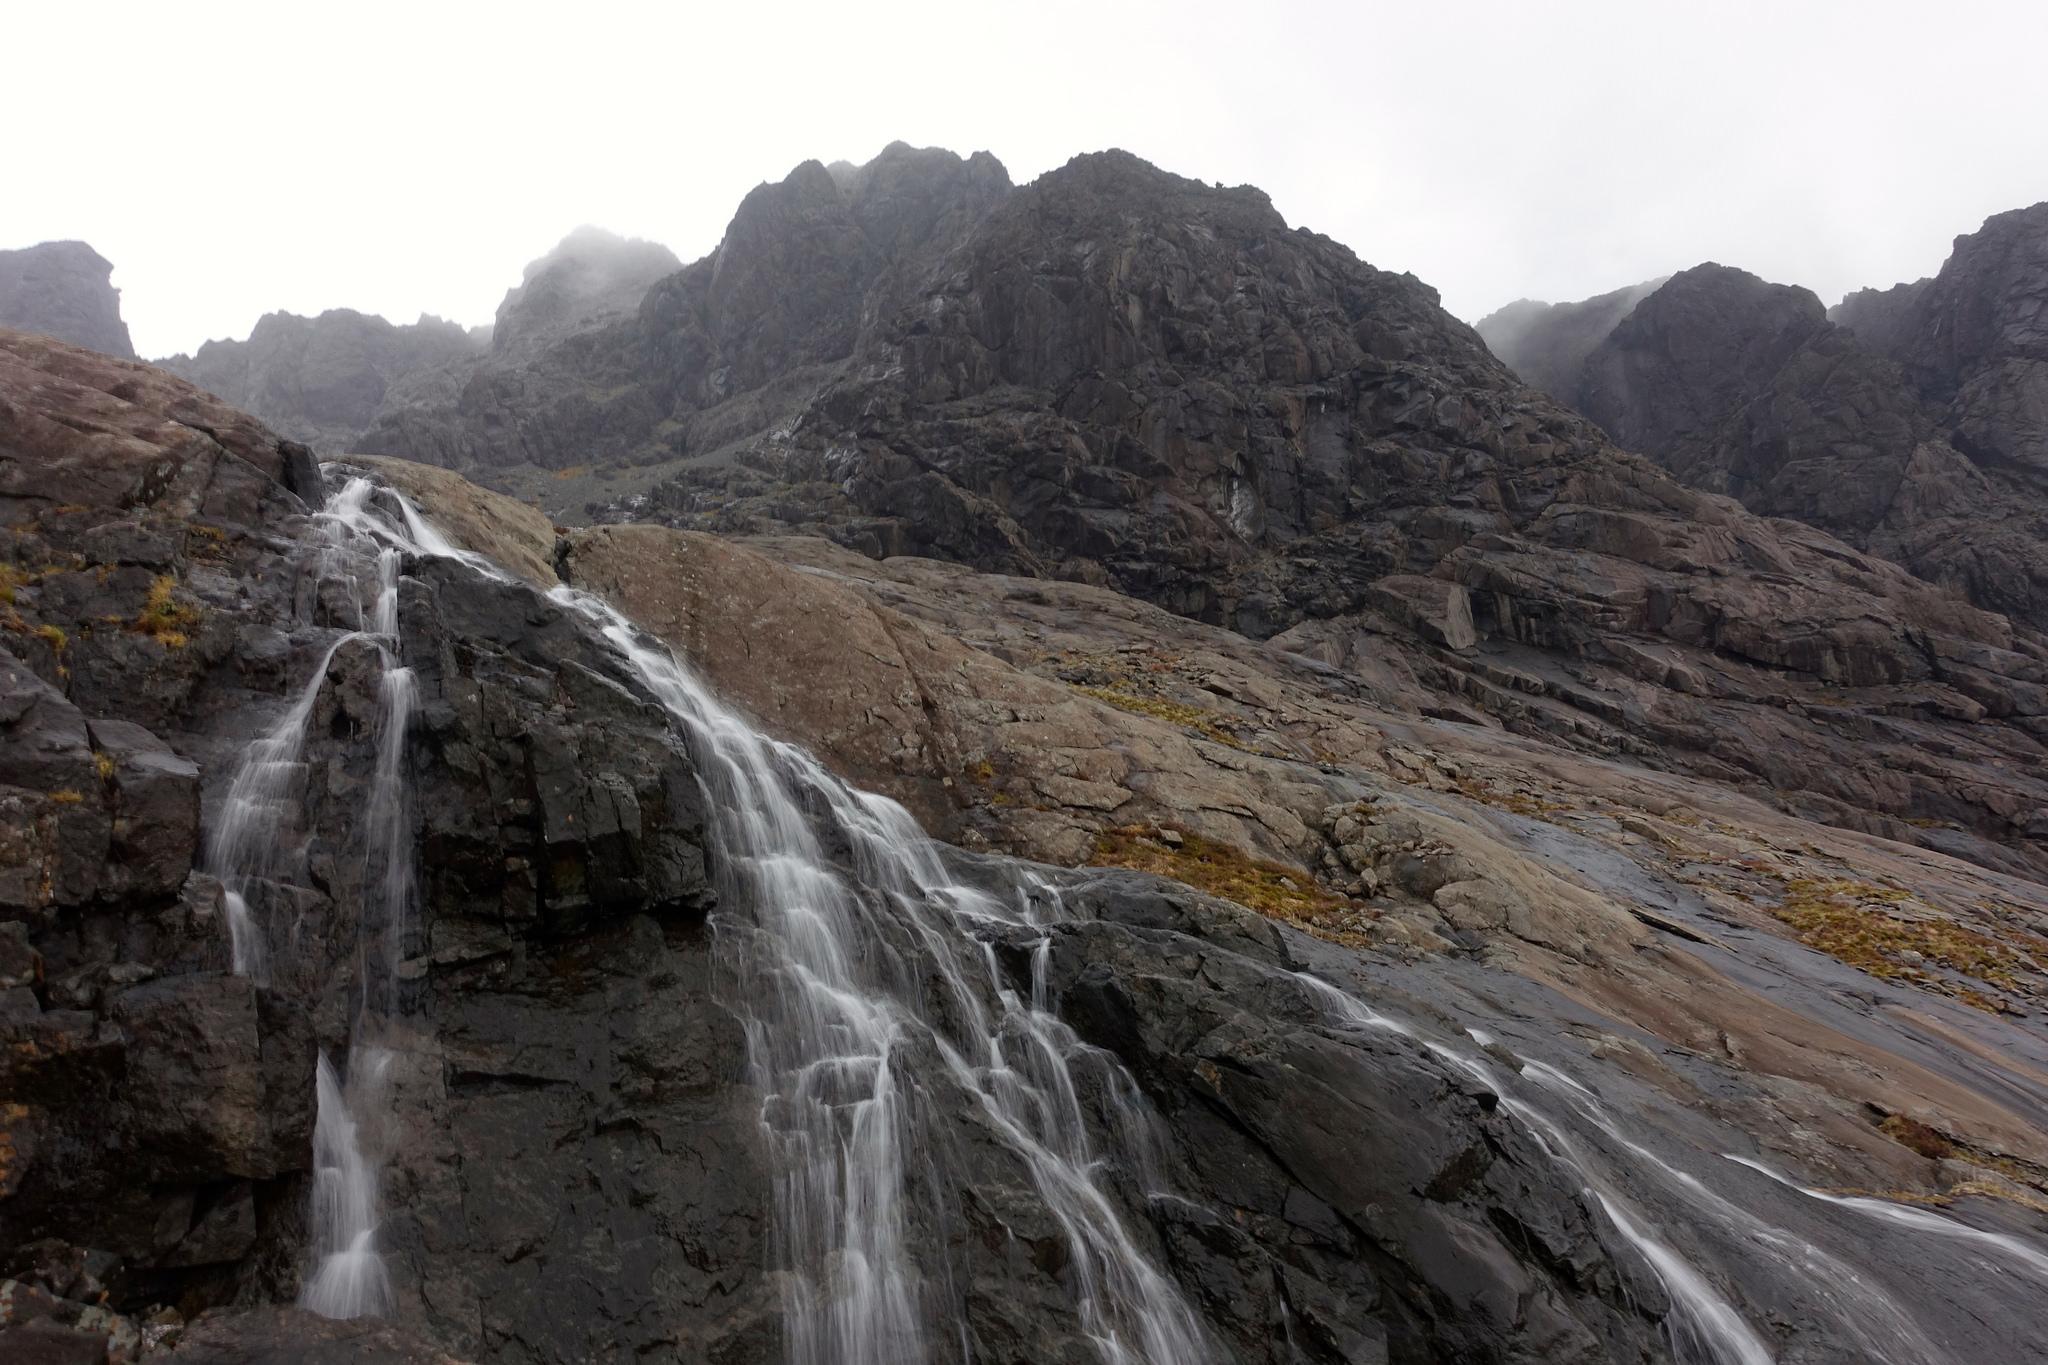 Waterfall below Coire Lagan